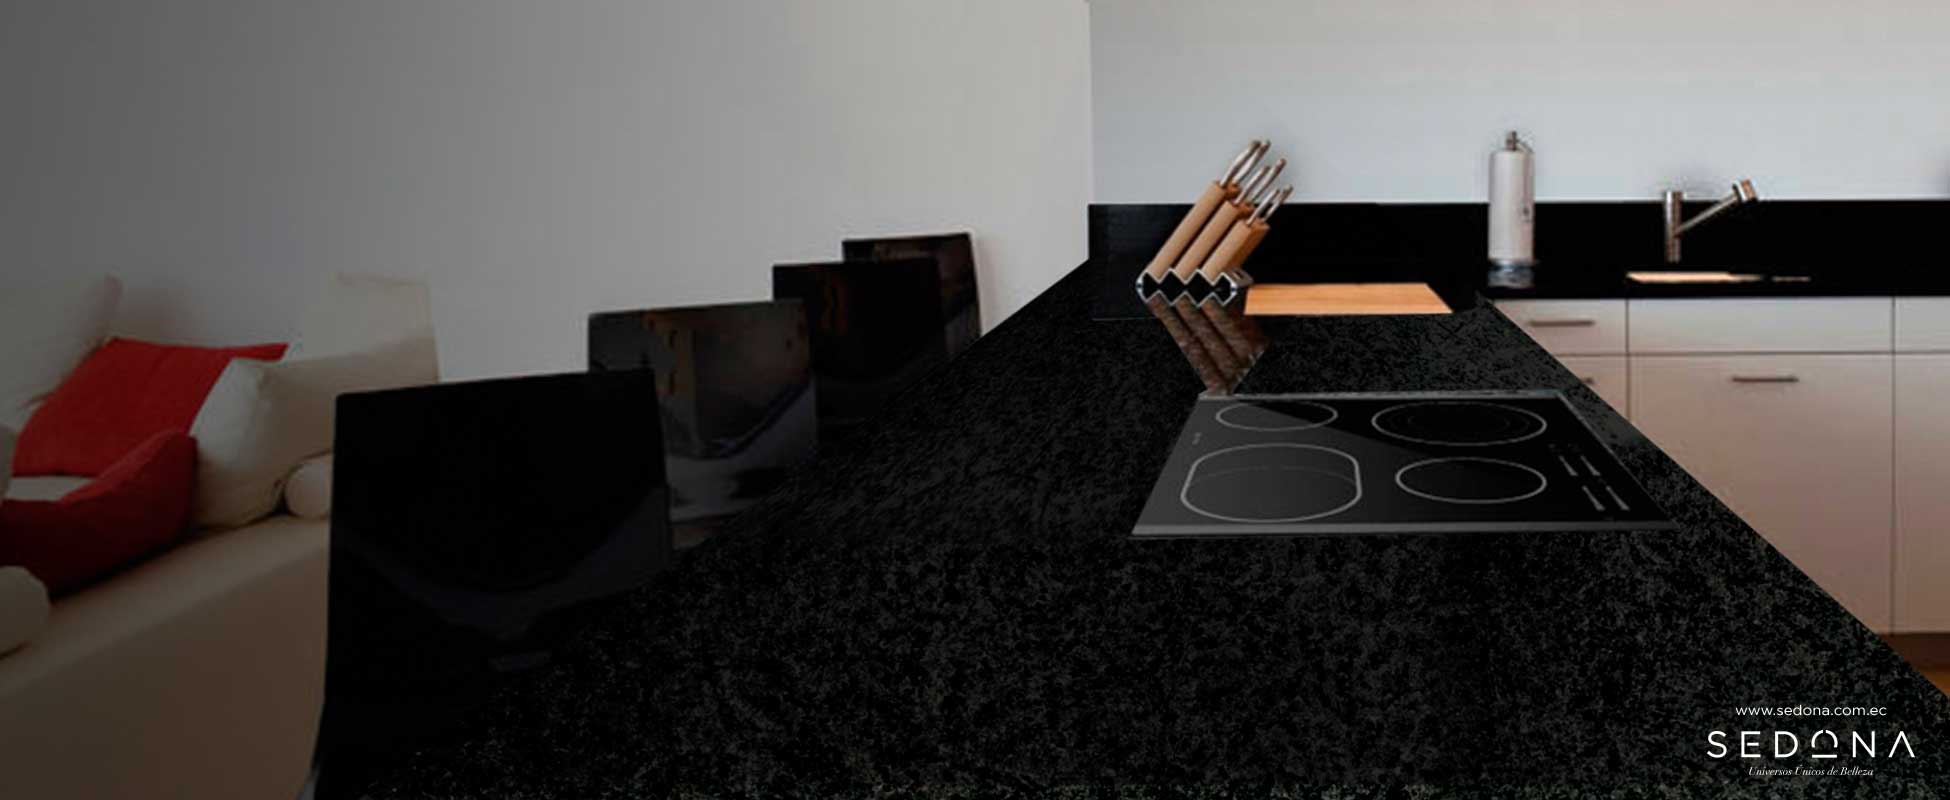 Granito | Negro Café – • SEDONA Importador Directo ...